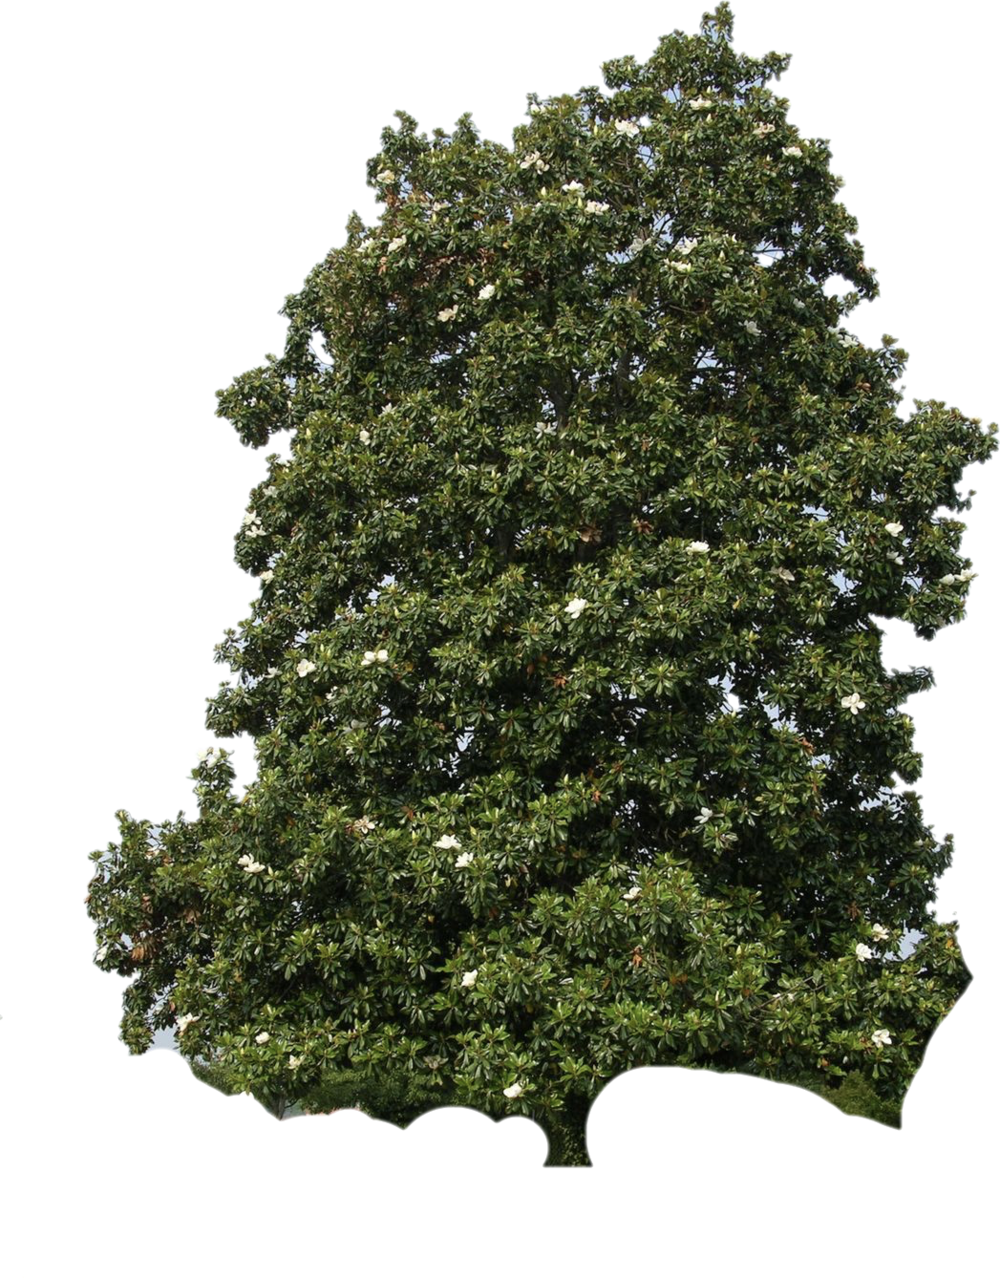 southern magnolia tree-cutout.png